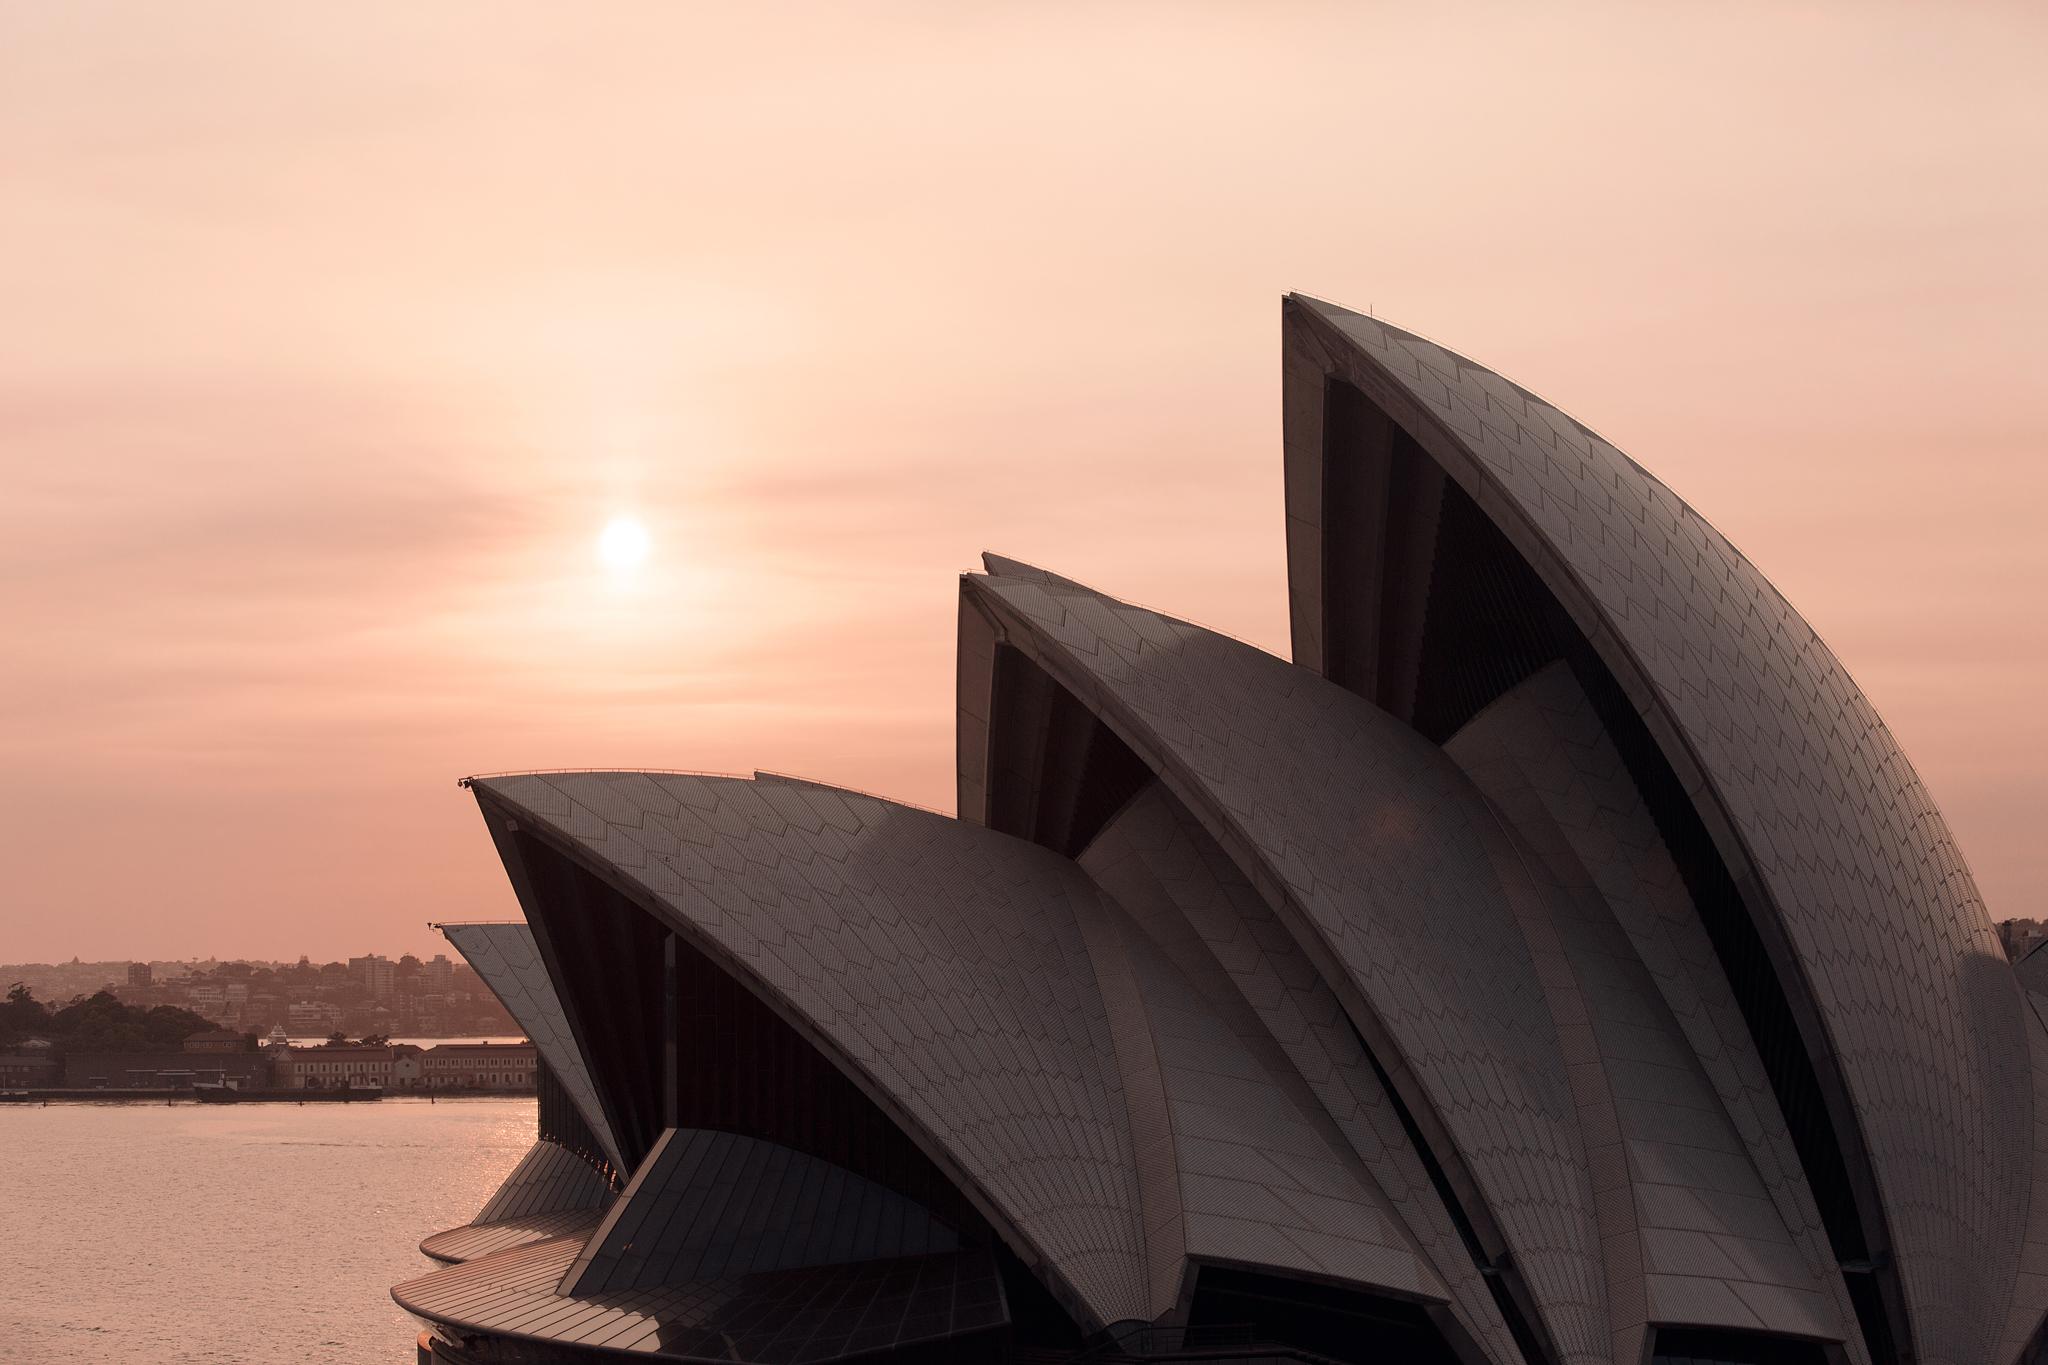 Resedagbok: Sydney del 2